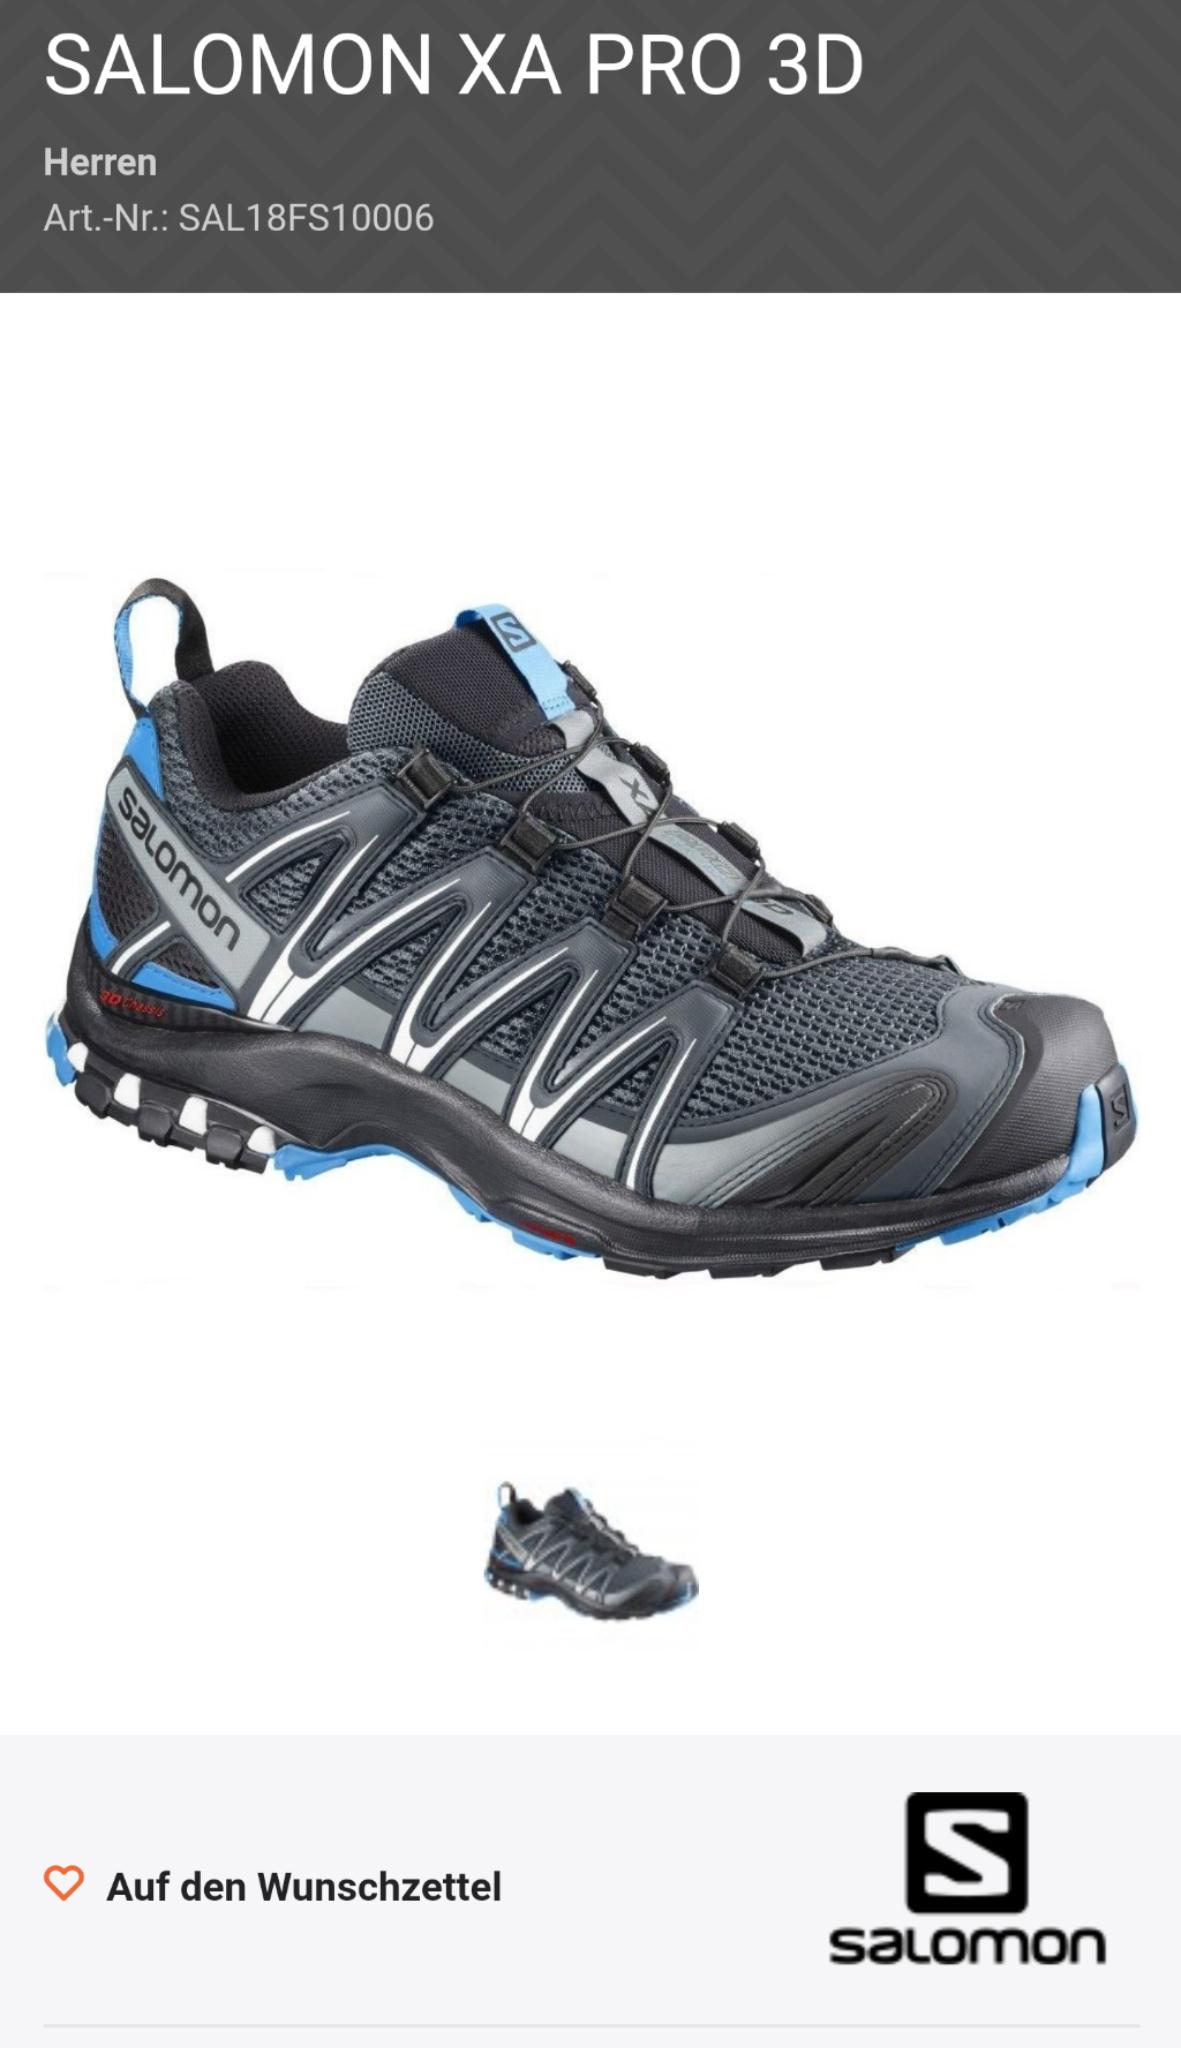 SALOMON XA PRO 3D Trial Schuhe